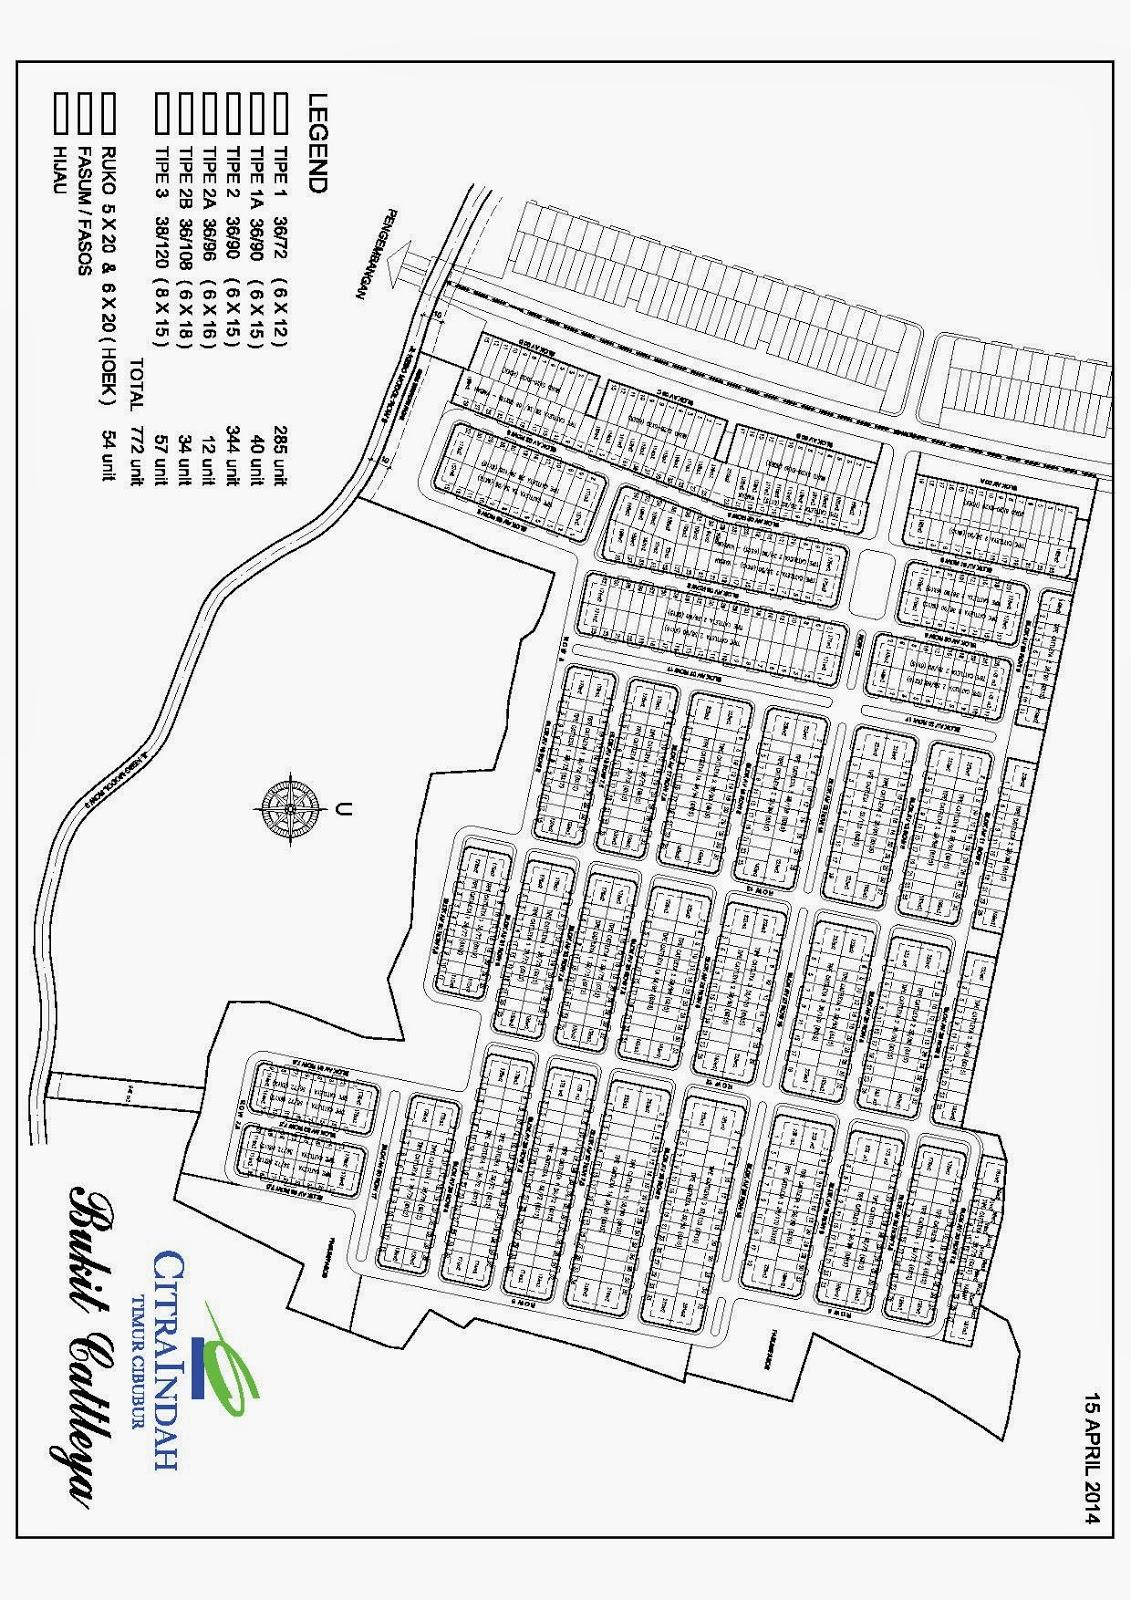 Citra Indah - Siteplan Bukit Cattleya